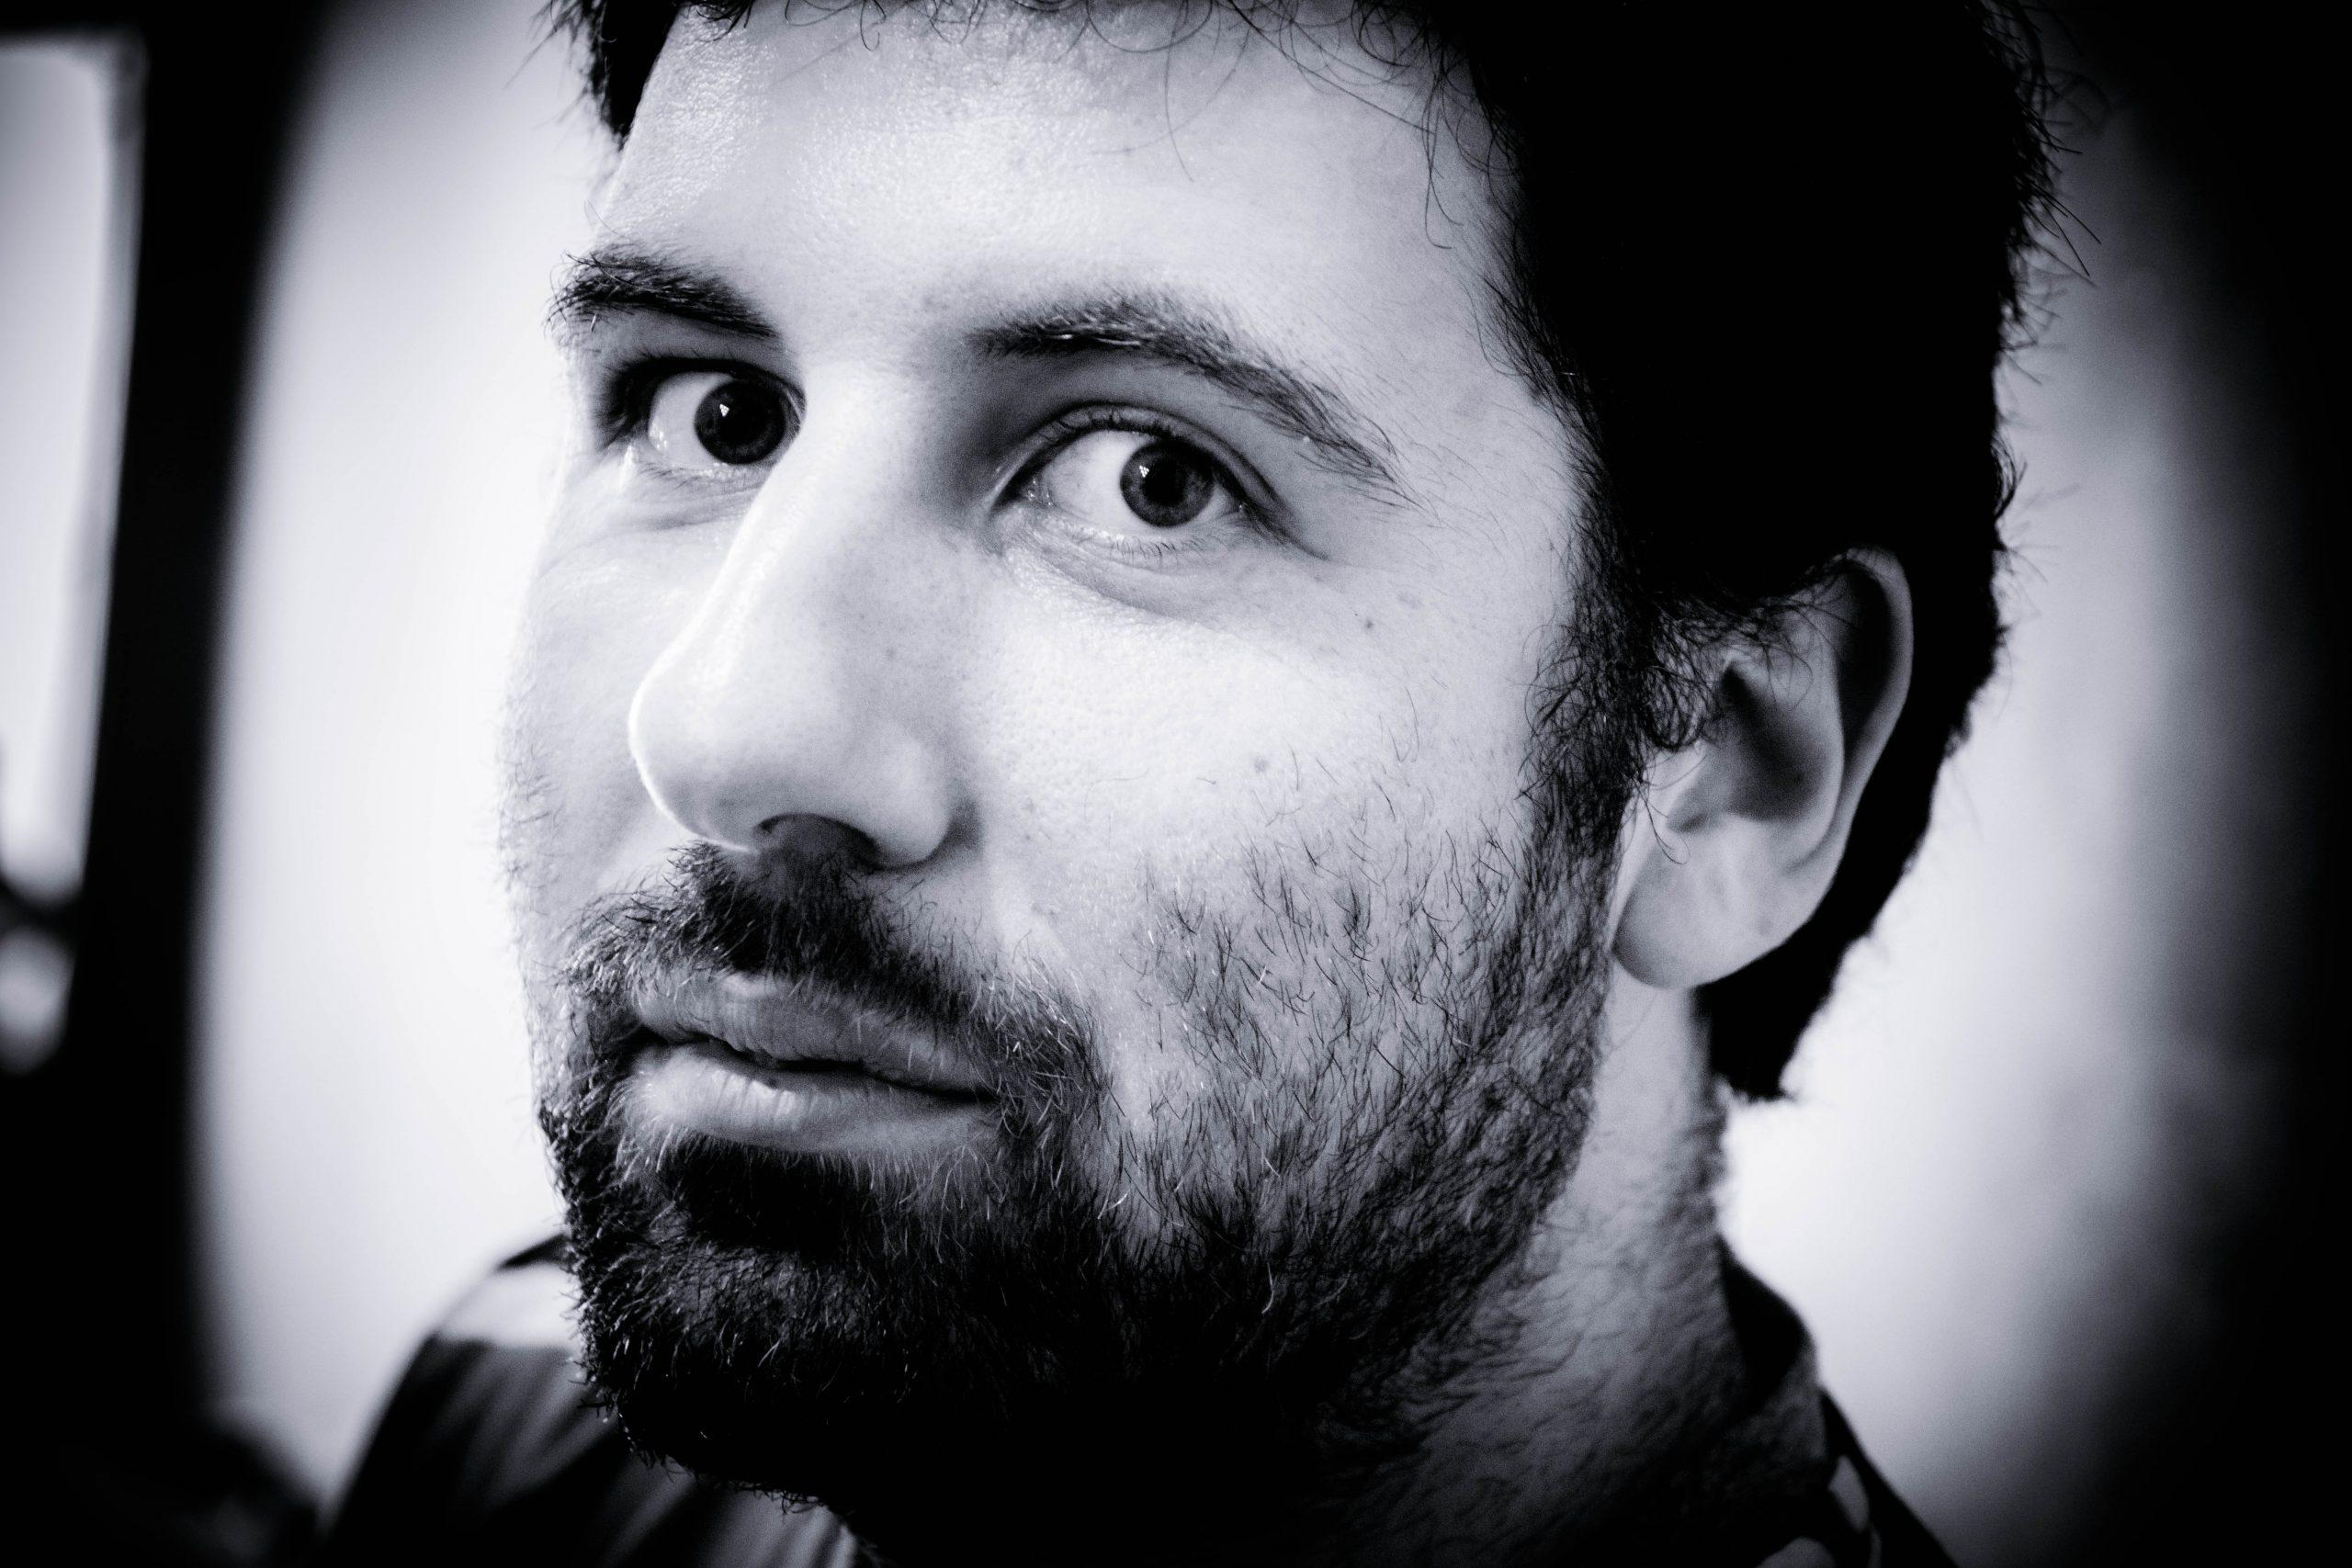 Jorge Oscar Gianotti